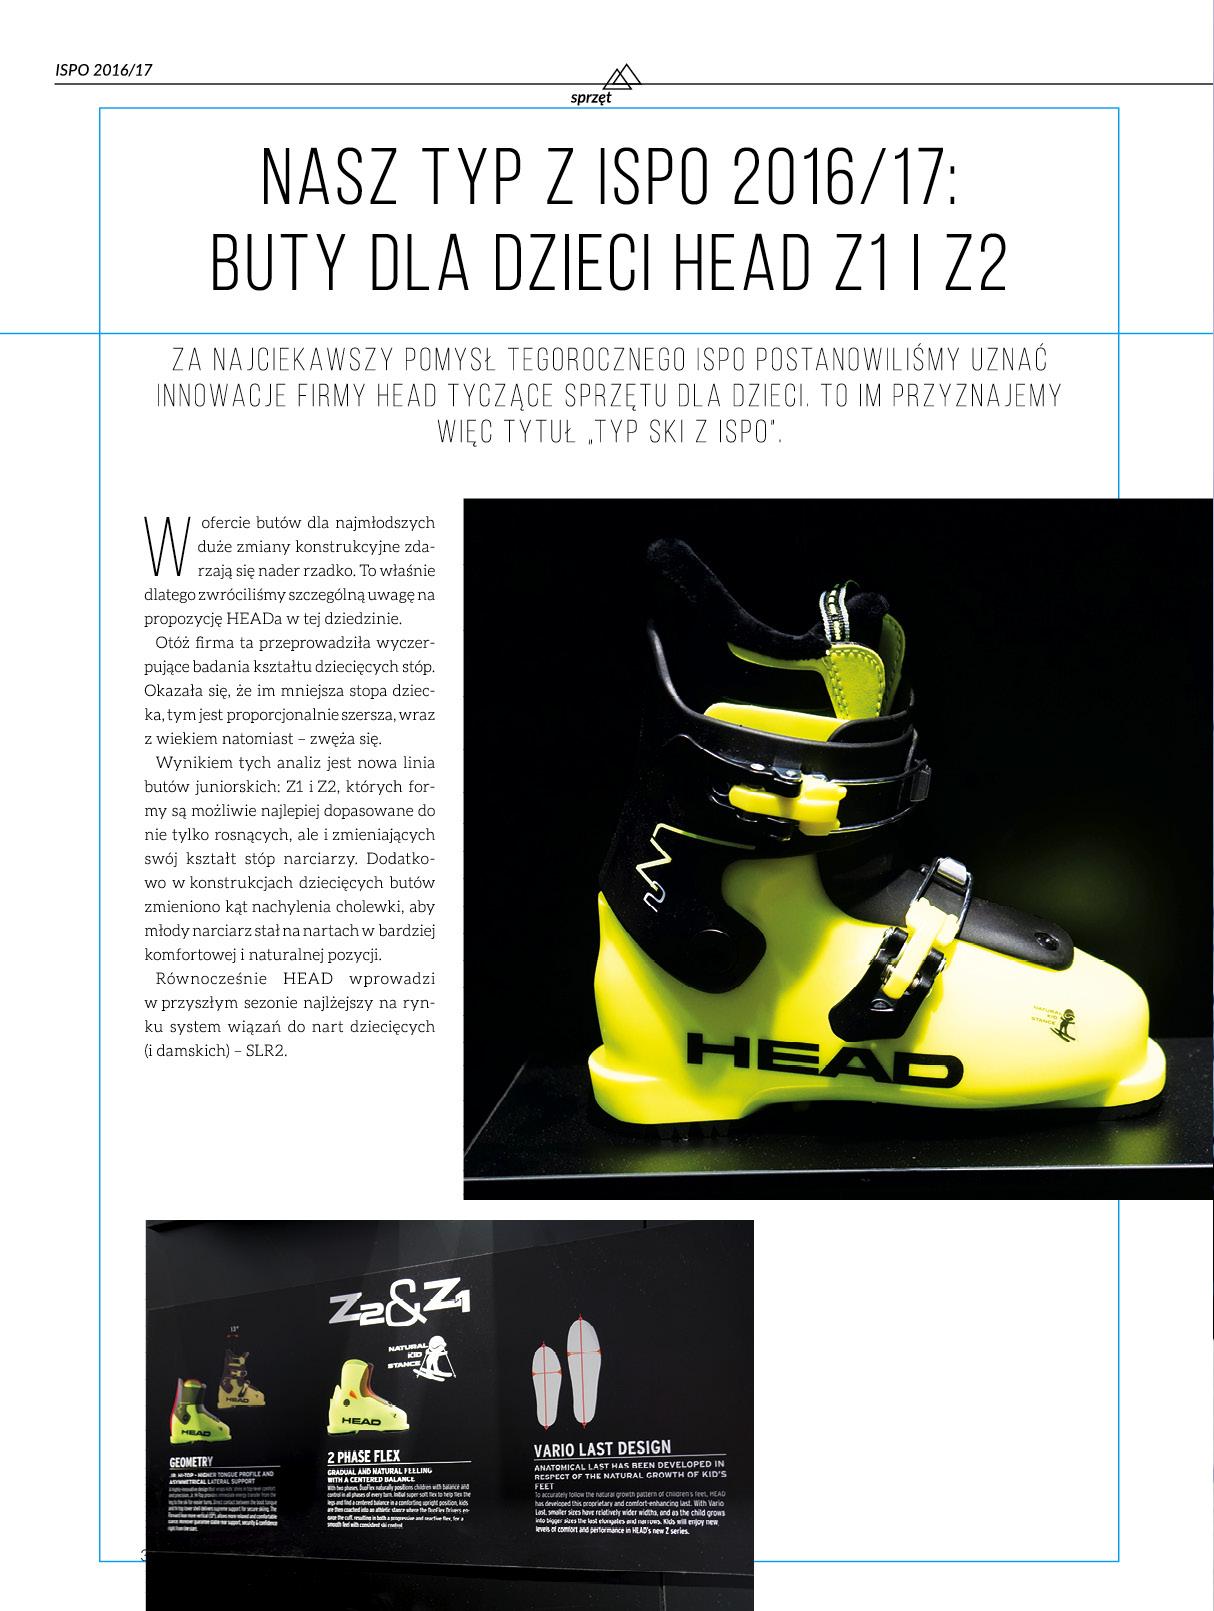 Ski_7134